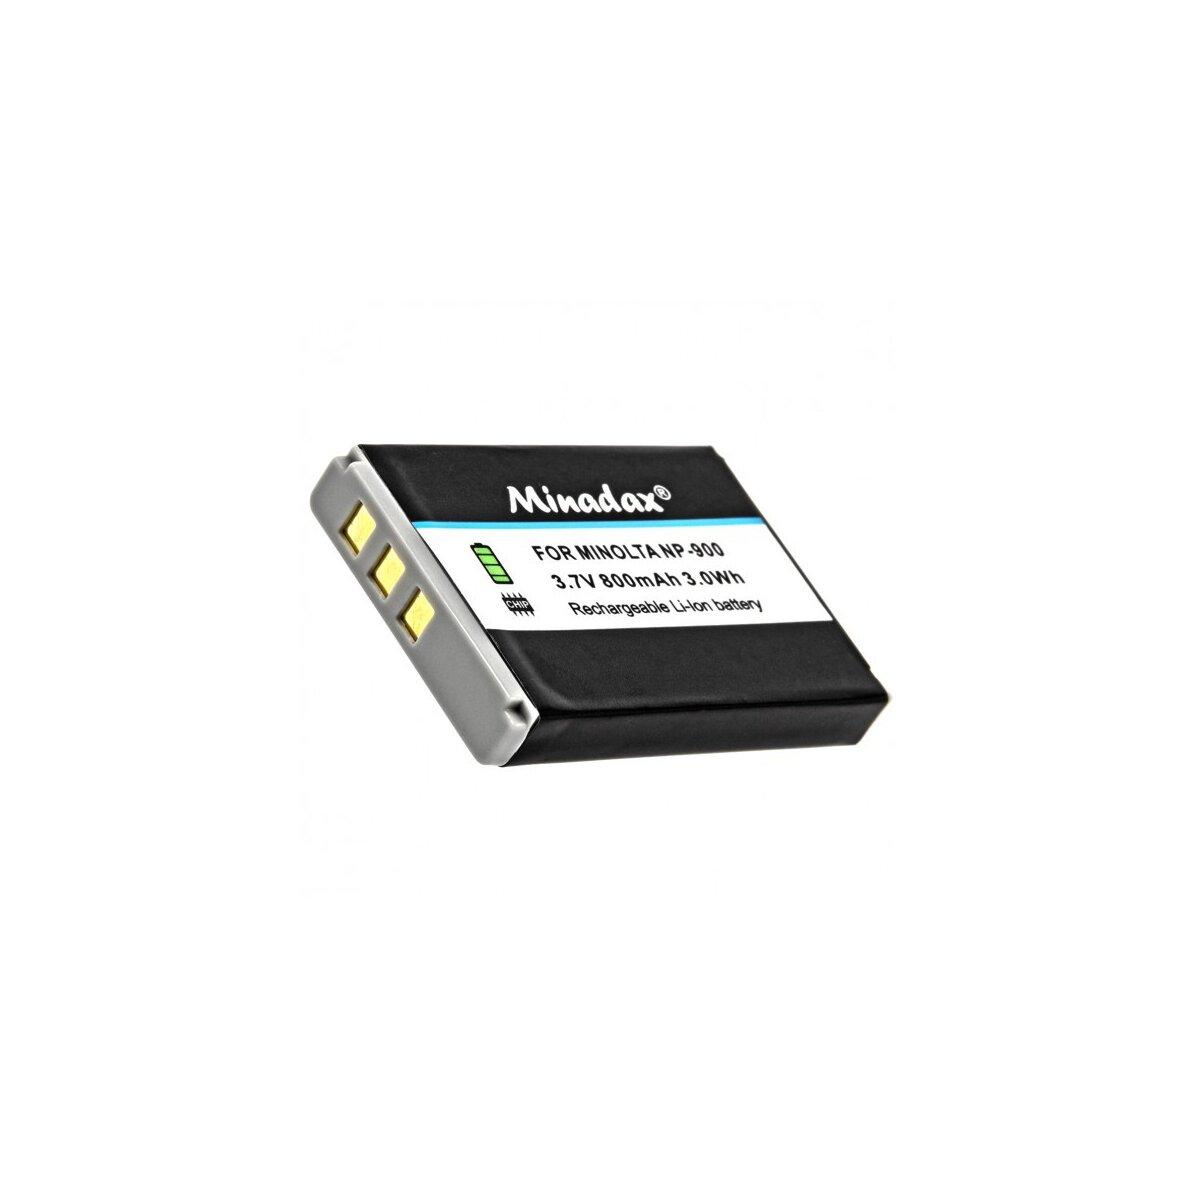 Minadax® Qualitaetsakku mit echten 800 mAh fuer Minolta E40, E50, D4, Aldi-X5, Np-900, wie NP-900 - Intelligentes Akkusystem mit Chip